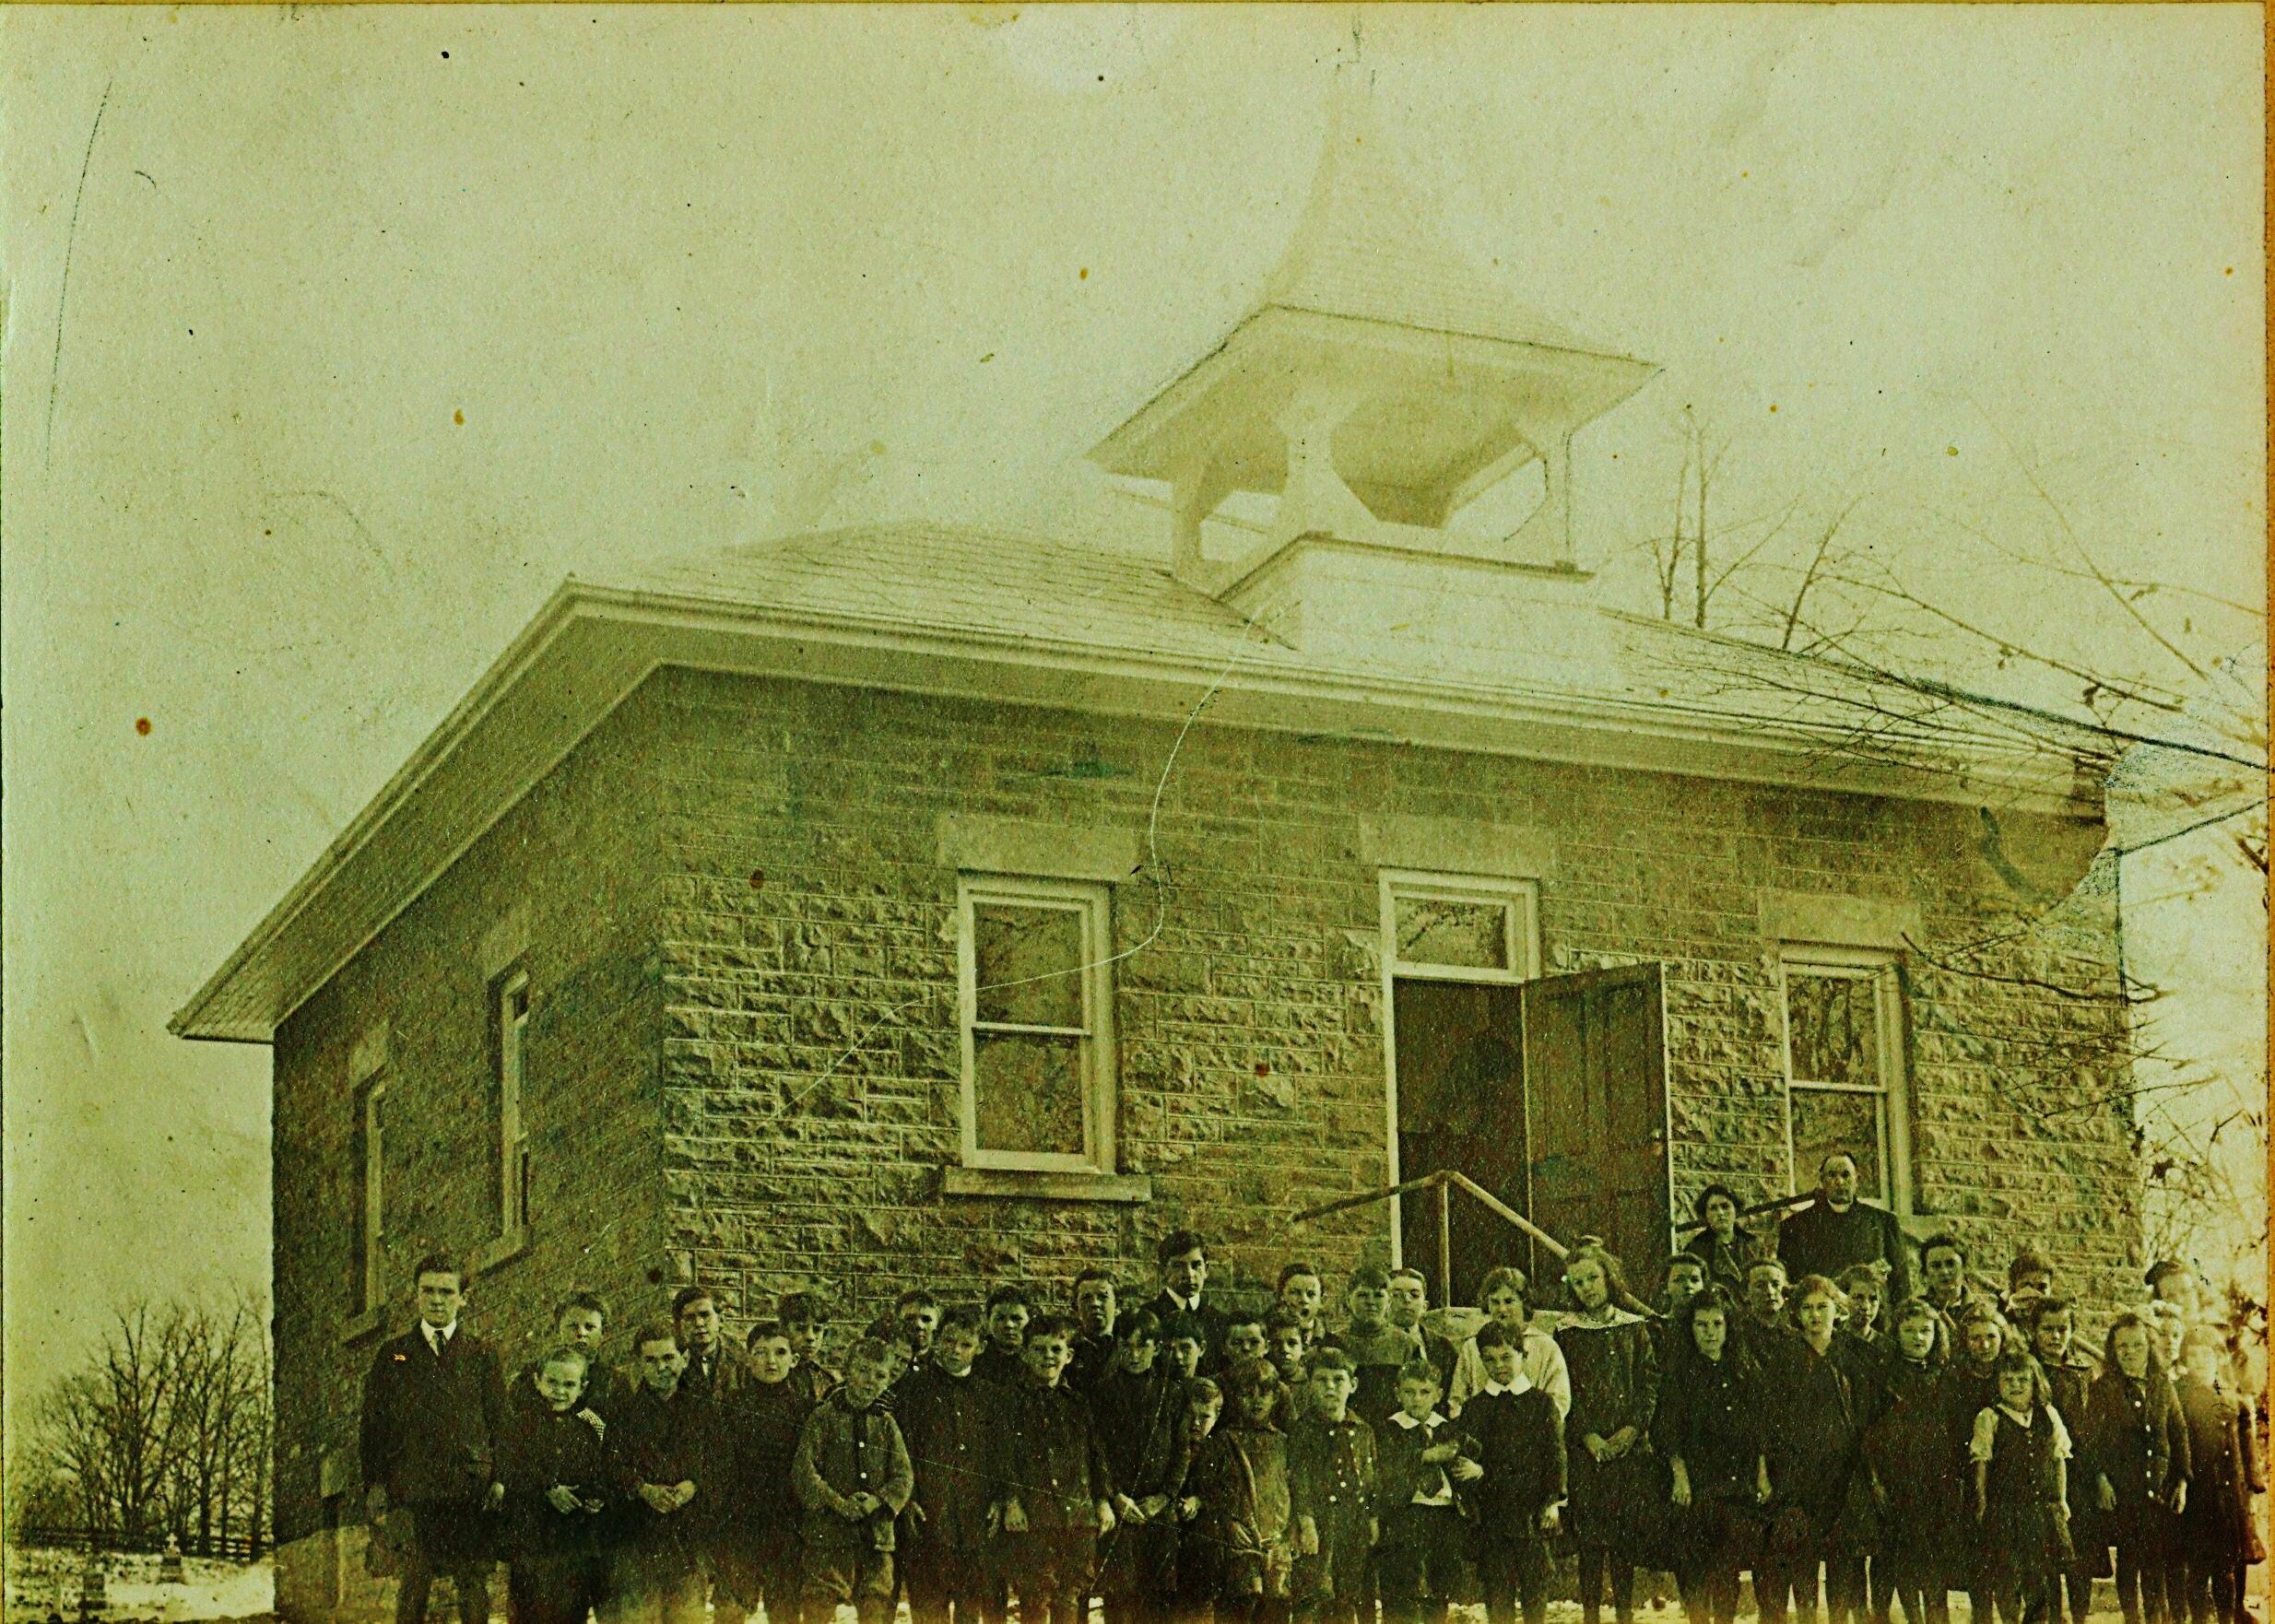 1915 Marmora Separate School, Mary Brennan teacher, Father Murtagh